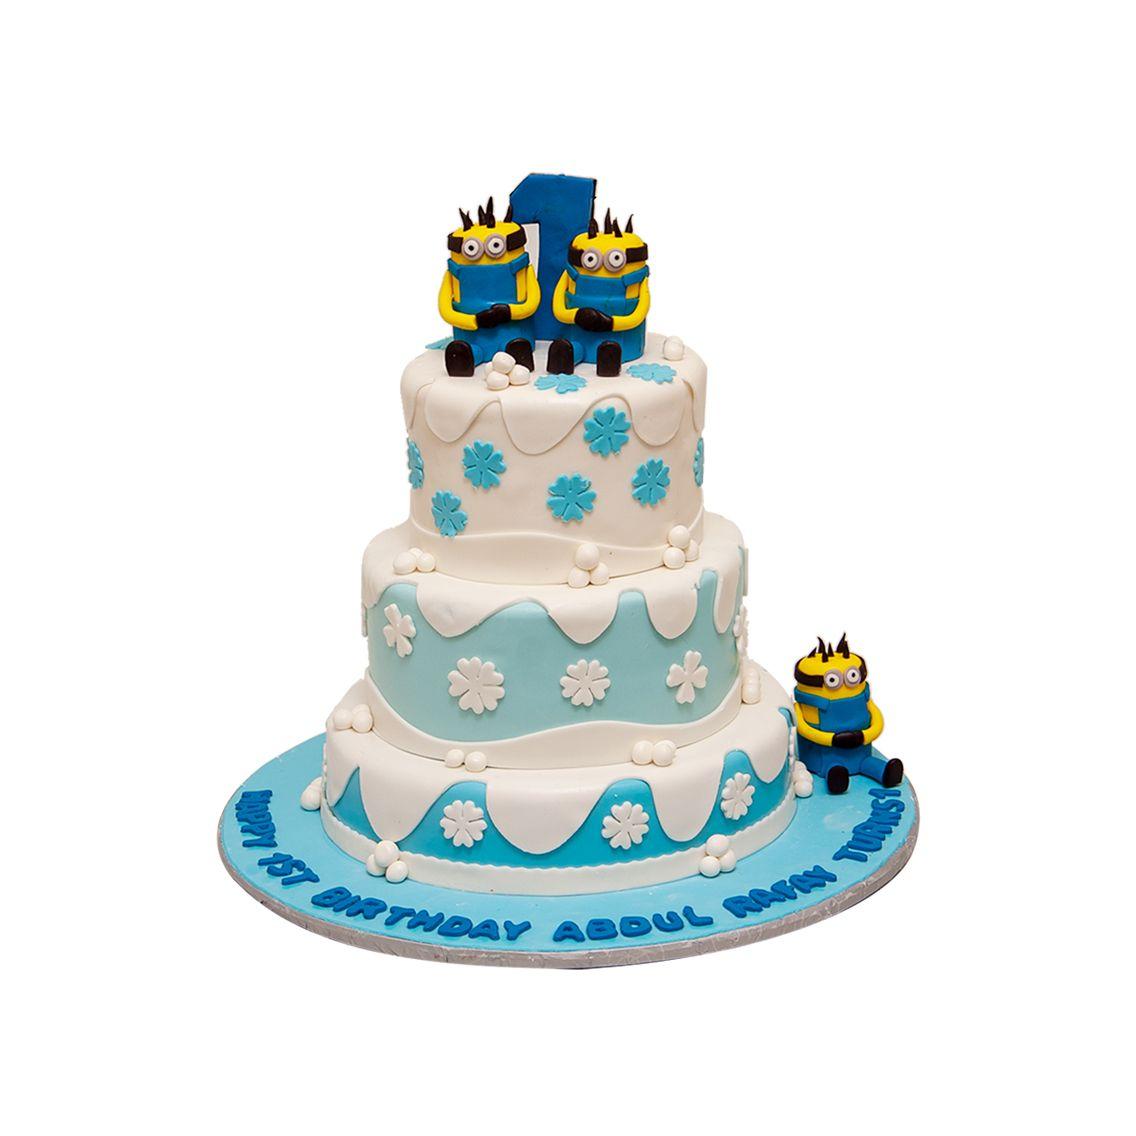 Kitchen Cuisine Default Category Minion with Frozen Theme Cake